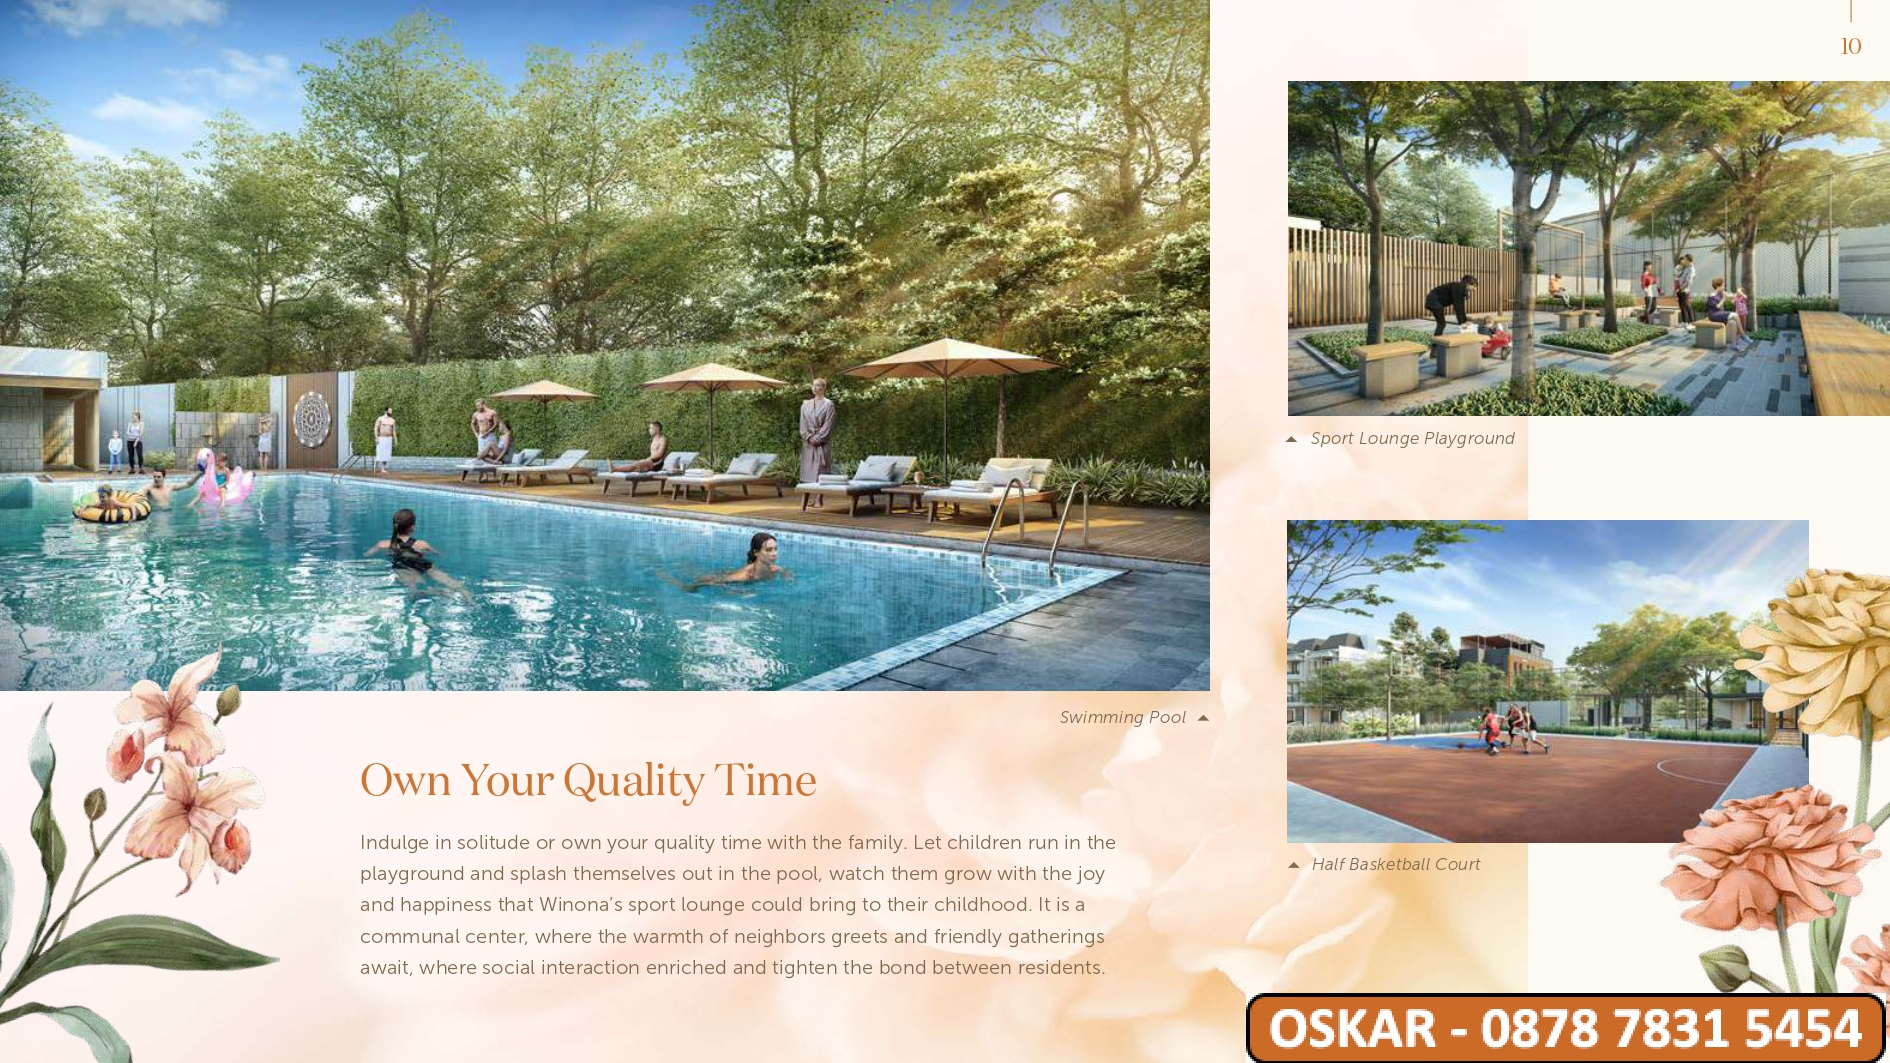 E-Brochure Alam Sutera Winona - Oskar_page-0010